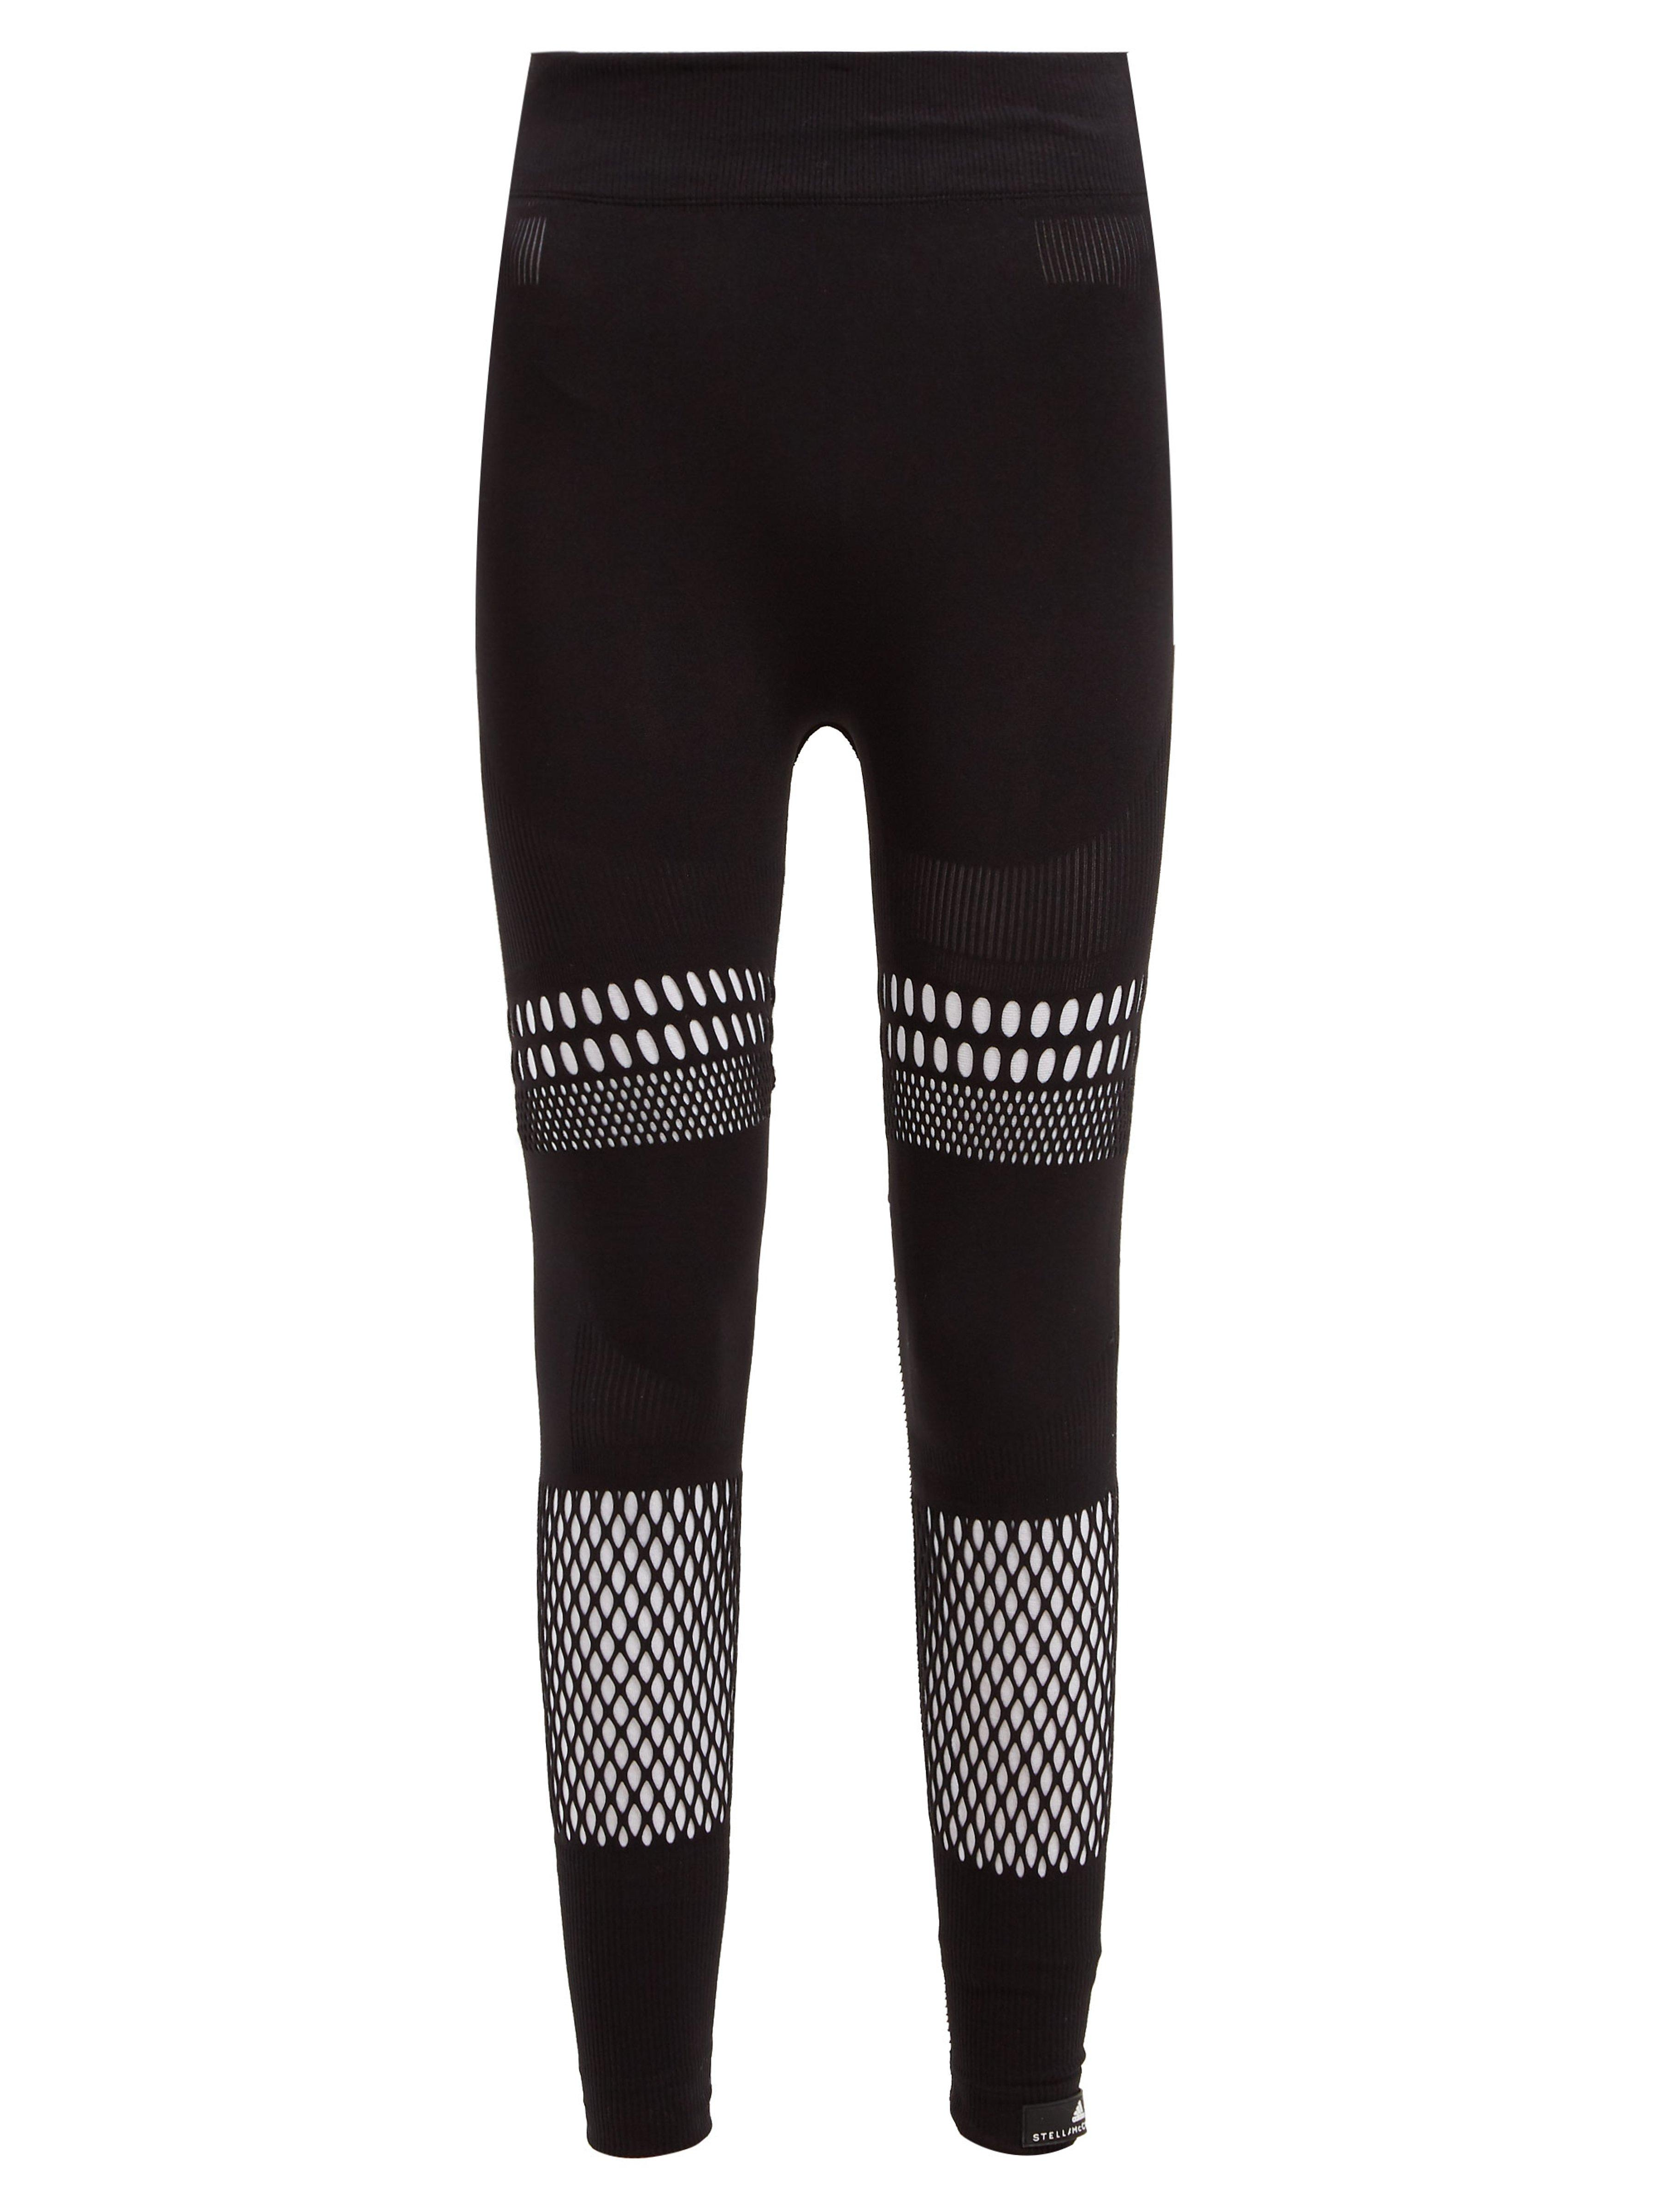 51f4fbbbe4b82 adidas By Stella McCartney Warp Knit Laser Cut Leggings in Black - Lyst